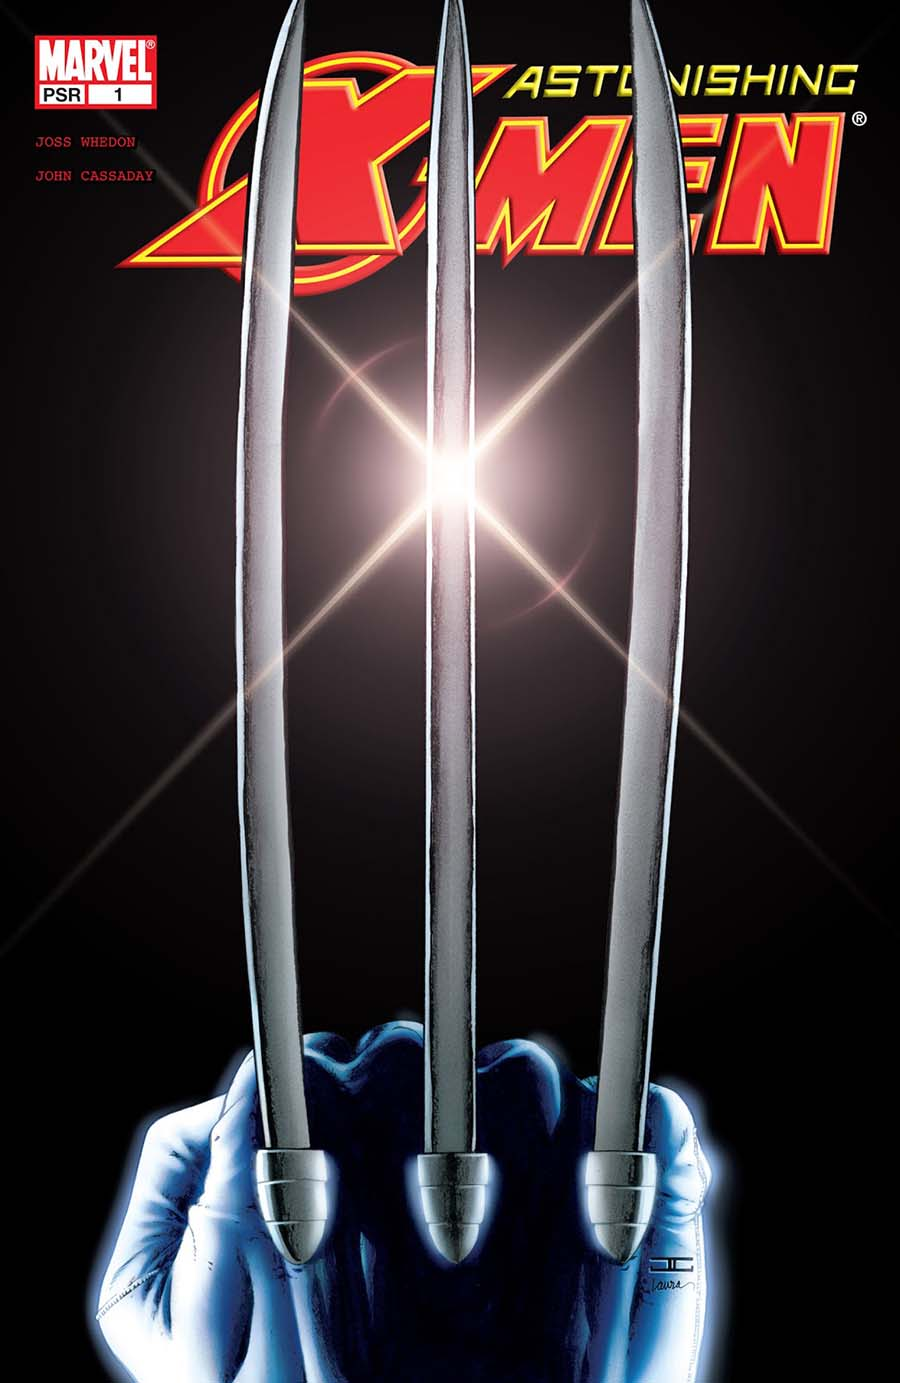 Astonishing X-Men (Joss Whedon)